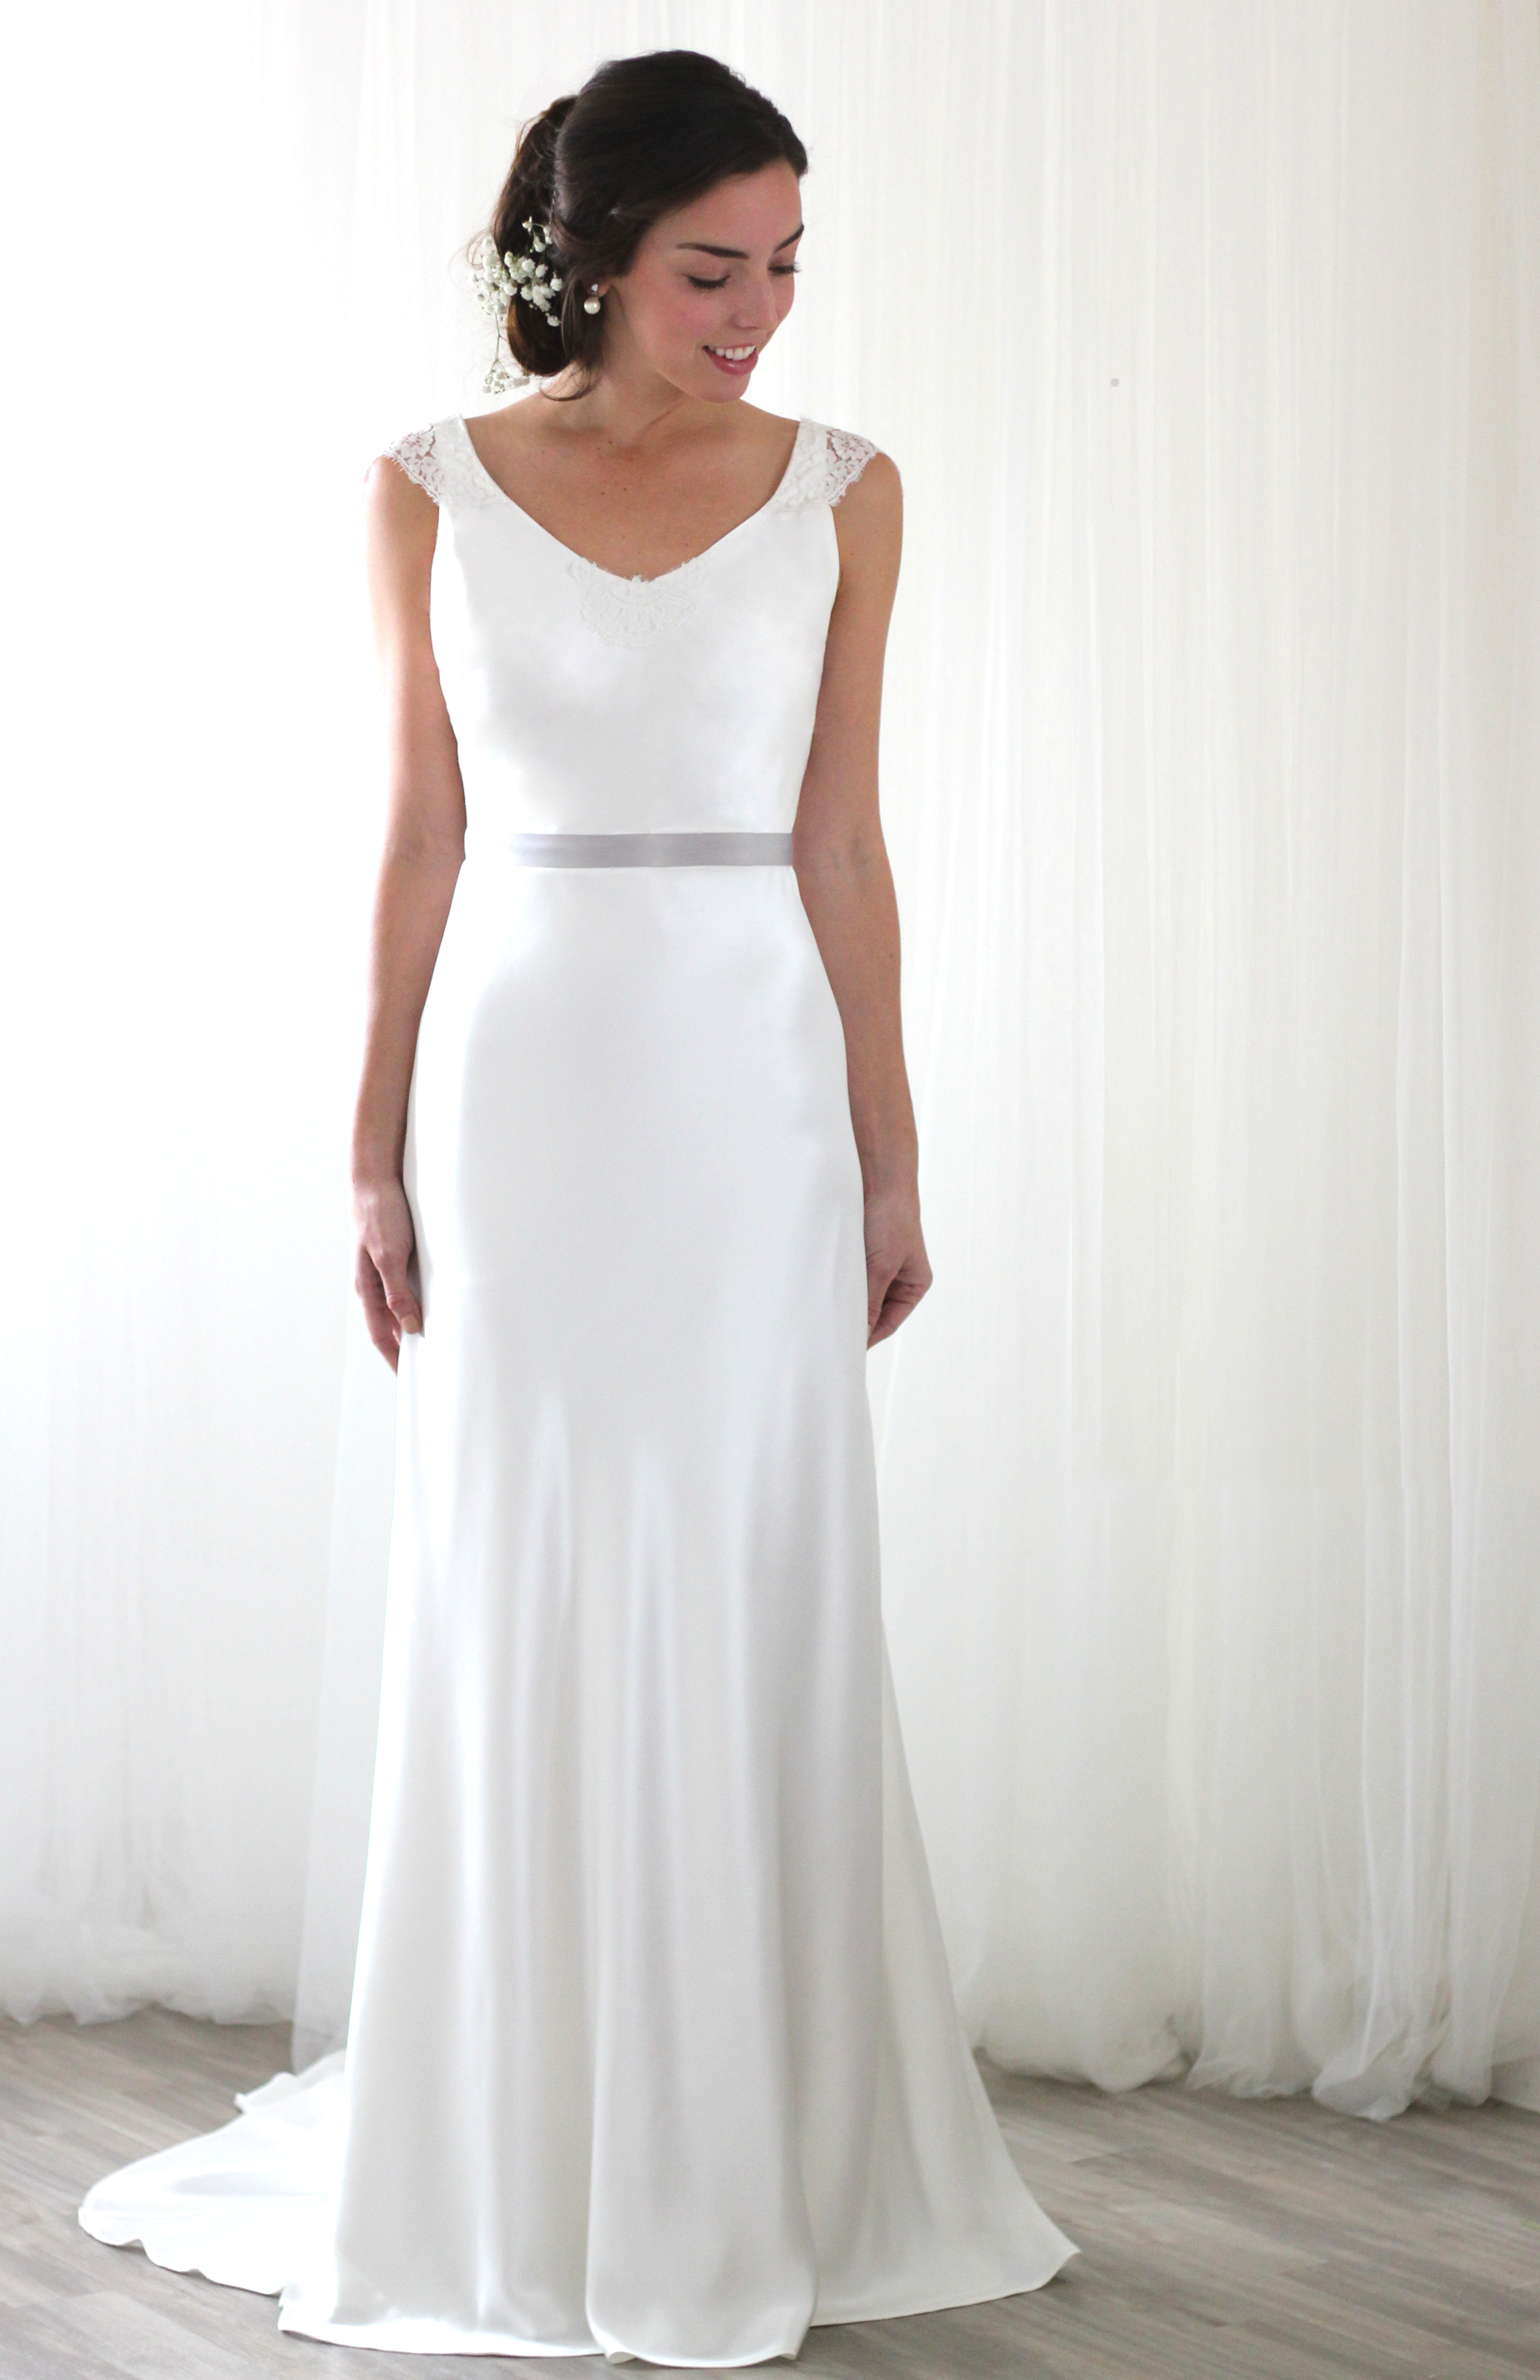 Fine Bridesmaid Dresses Galway Motif Princess Wedding